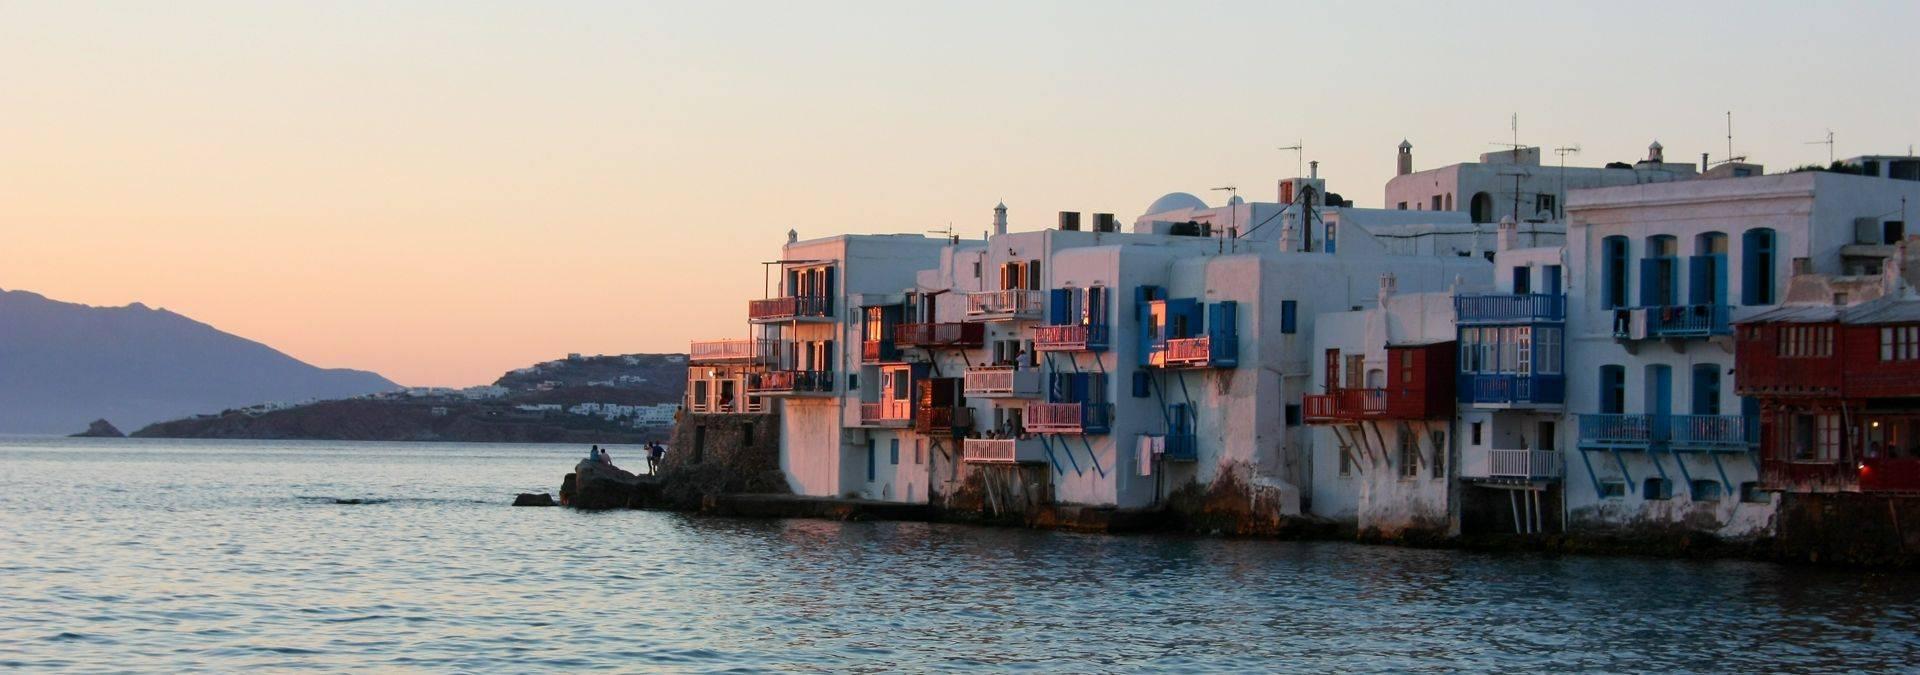 Mykonos Littel Venice 2